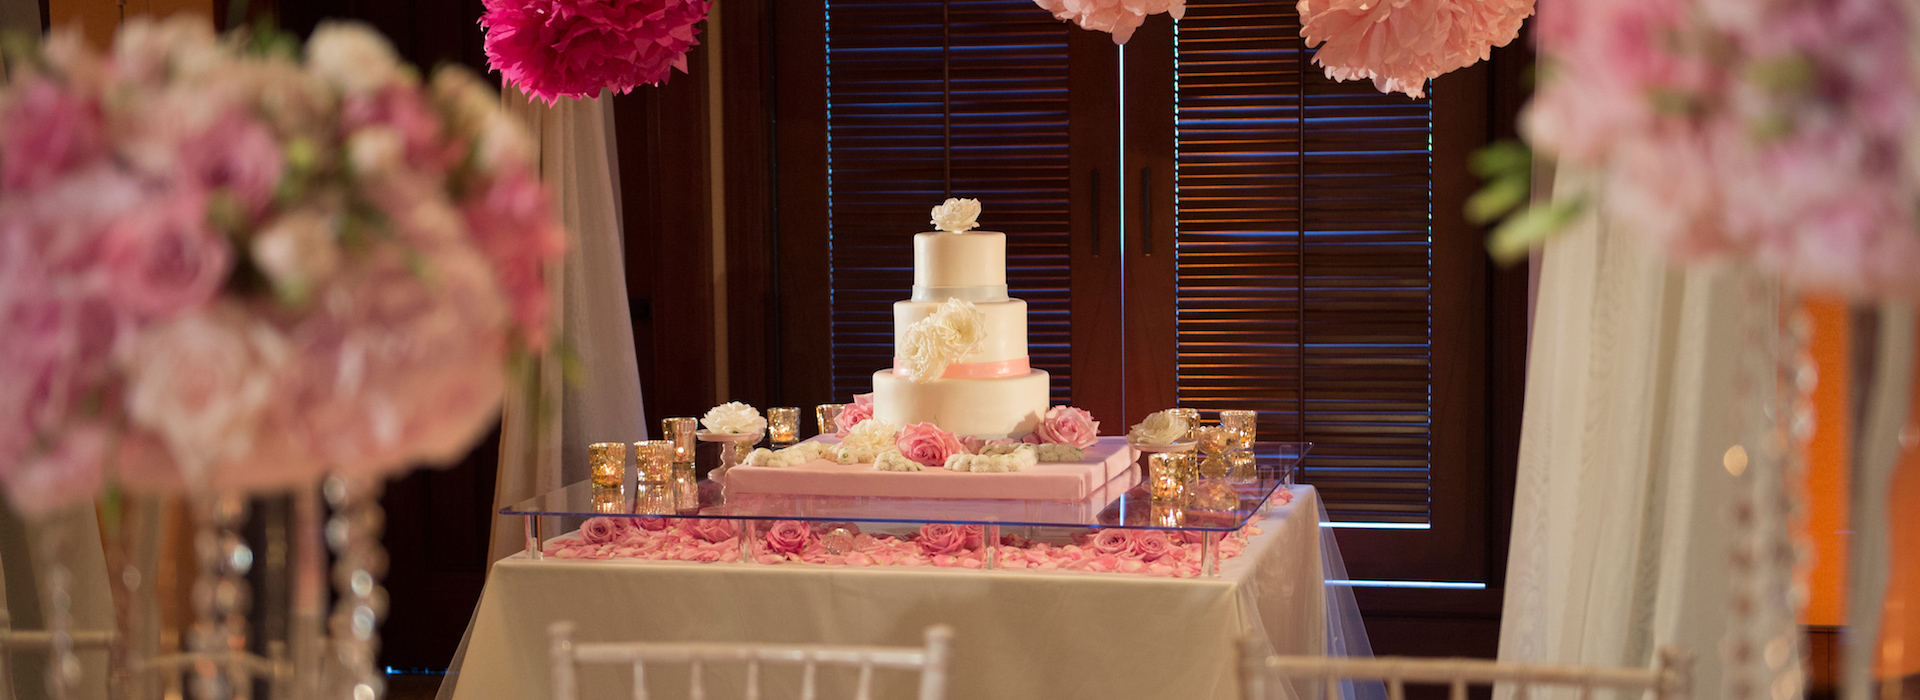 wedding cakes chattanooga tn